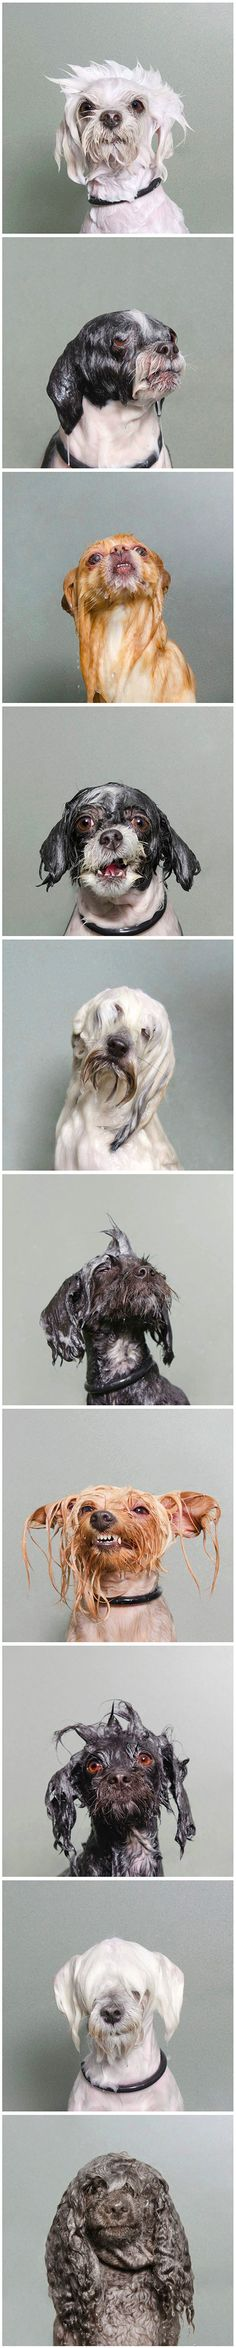 'Wet Dog' by Sophie Gamanda Si esto no te hace reir....